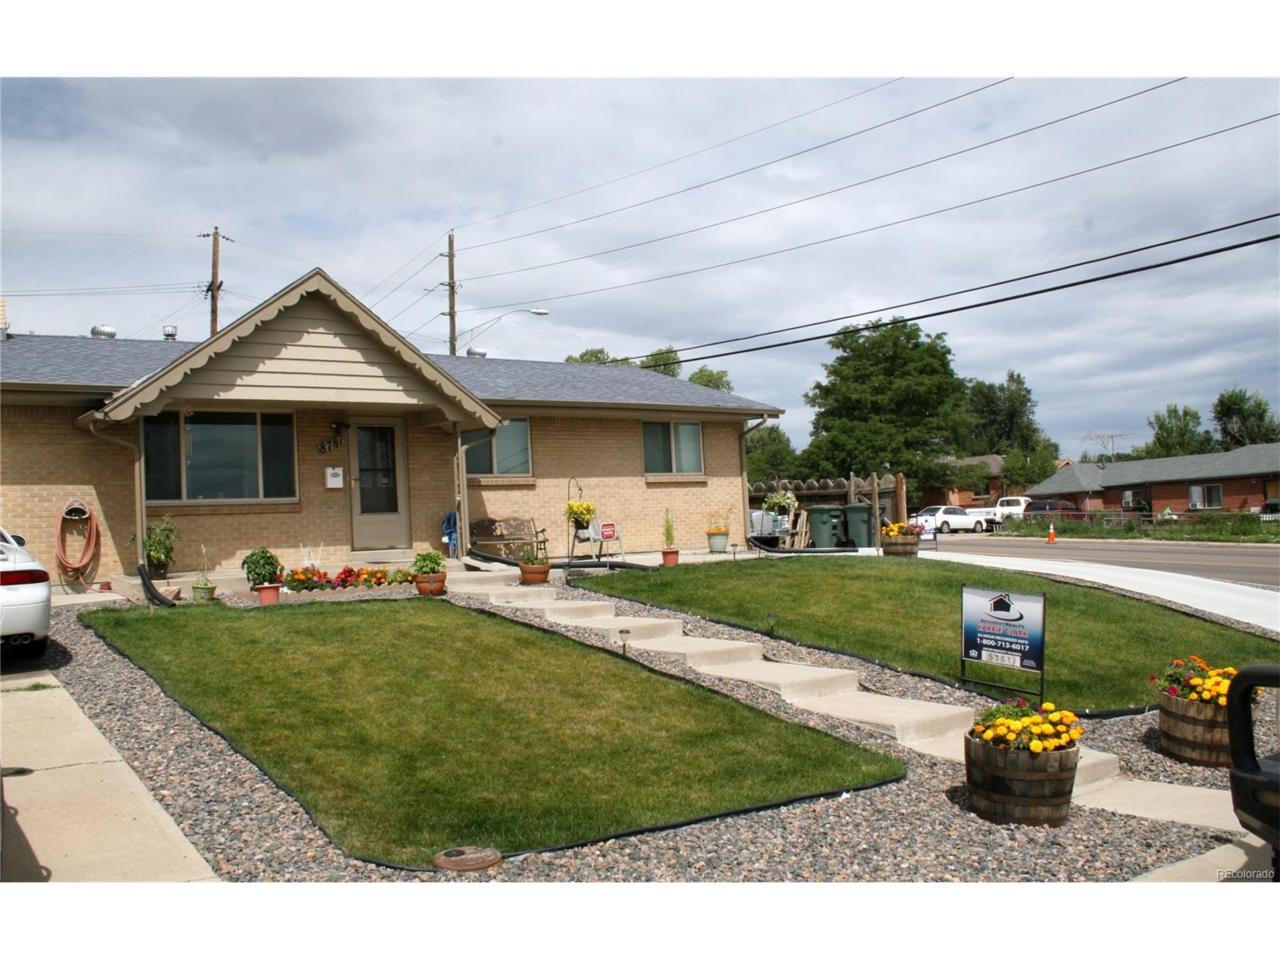 8781 Franklin Street, Denver, CO 80229 (MLS #5211284) :: 8z Real Estate